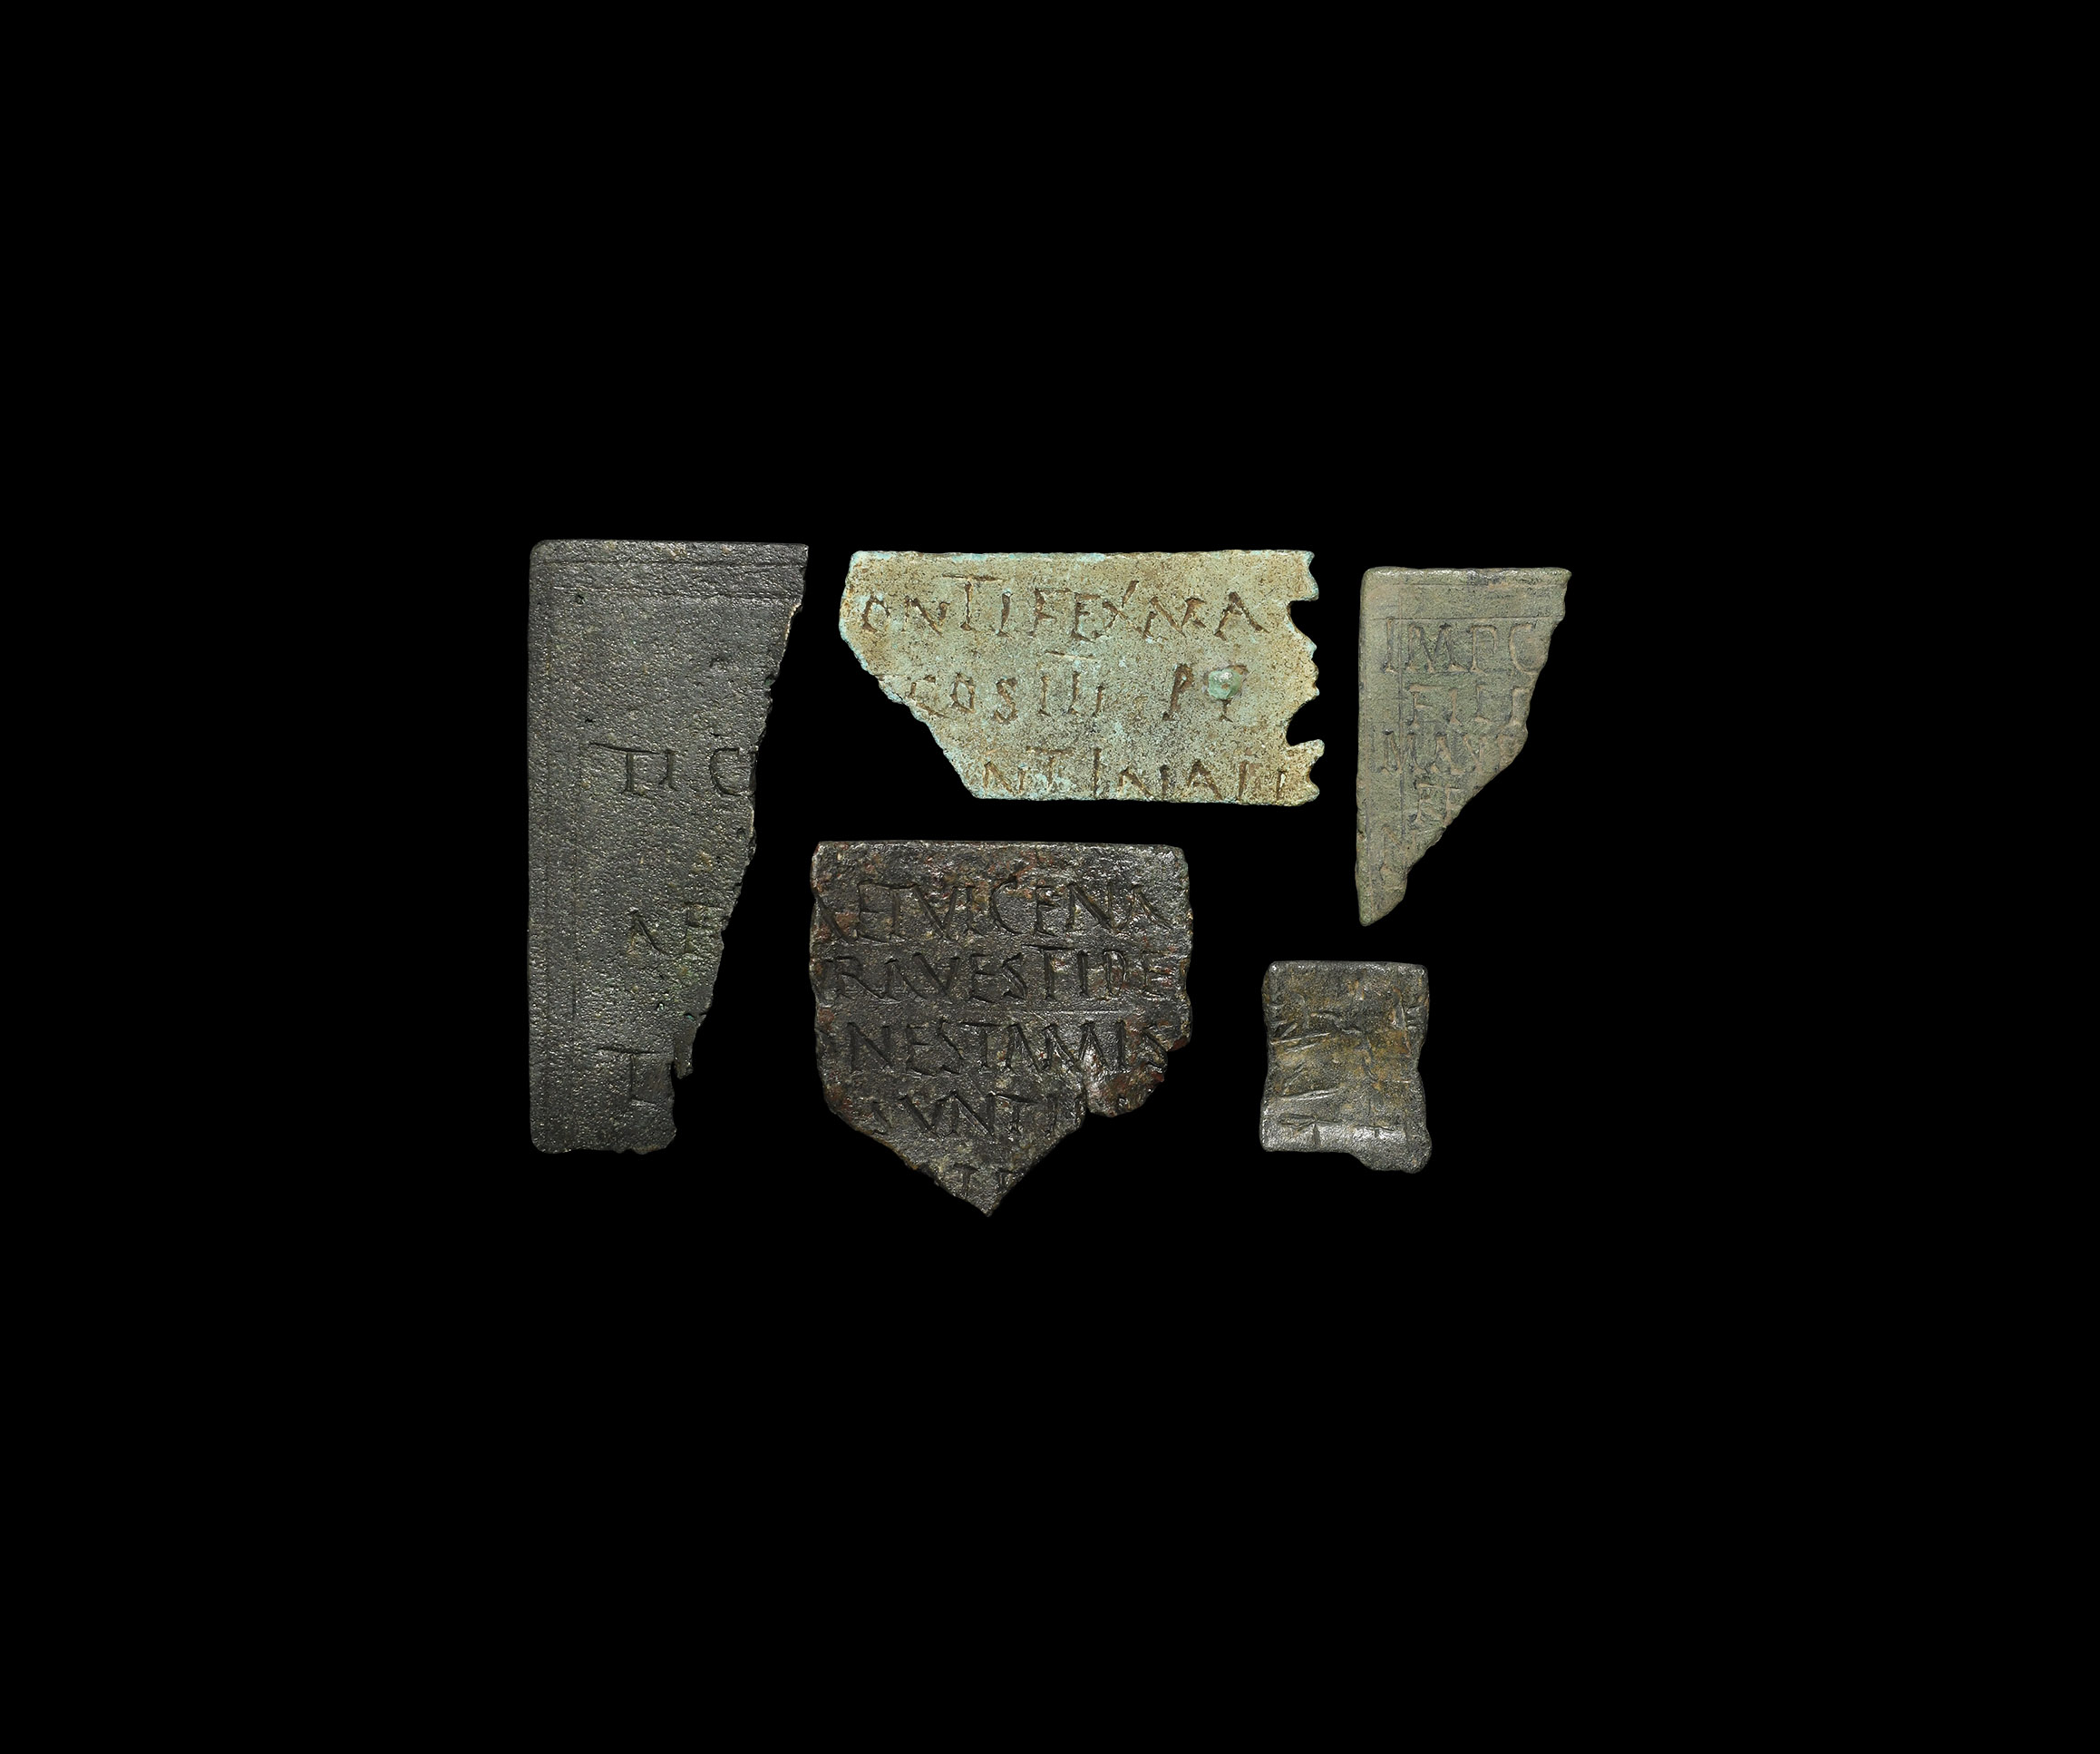 Roman Diploma Fragment Collection